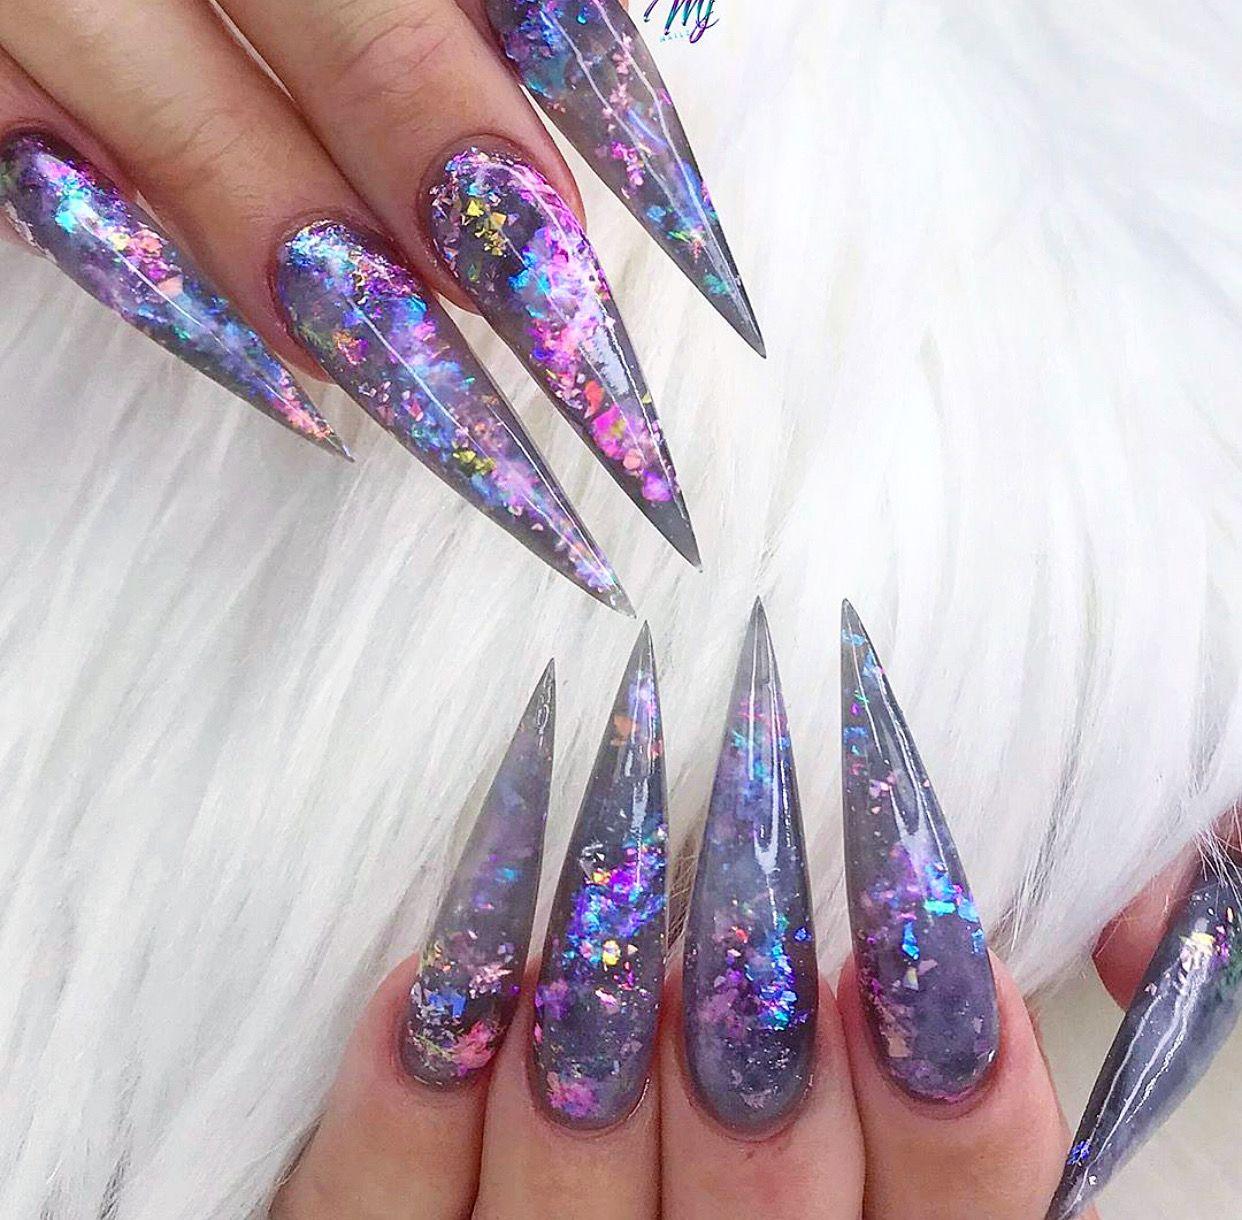 Galaxy Themed Stiletto Acrylic Nails In 2020 Opal Nails Best Acrylic Nails Long Acrylic Nails